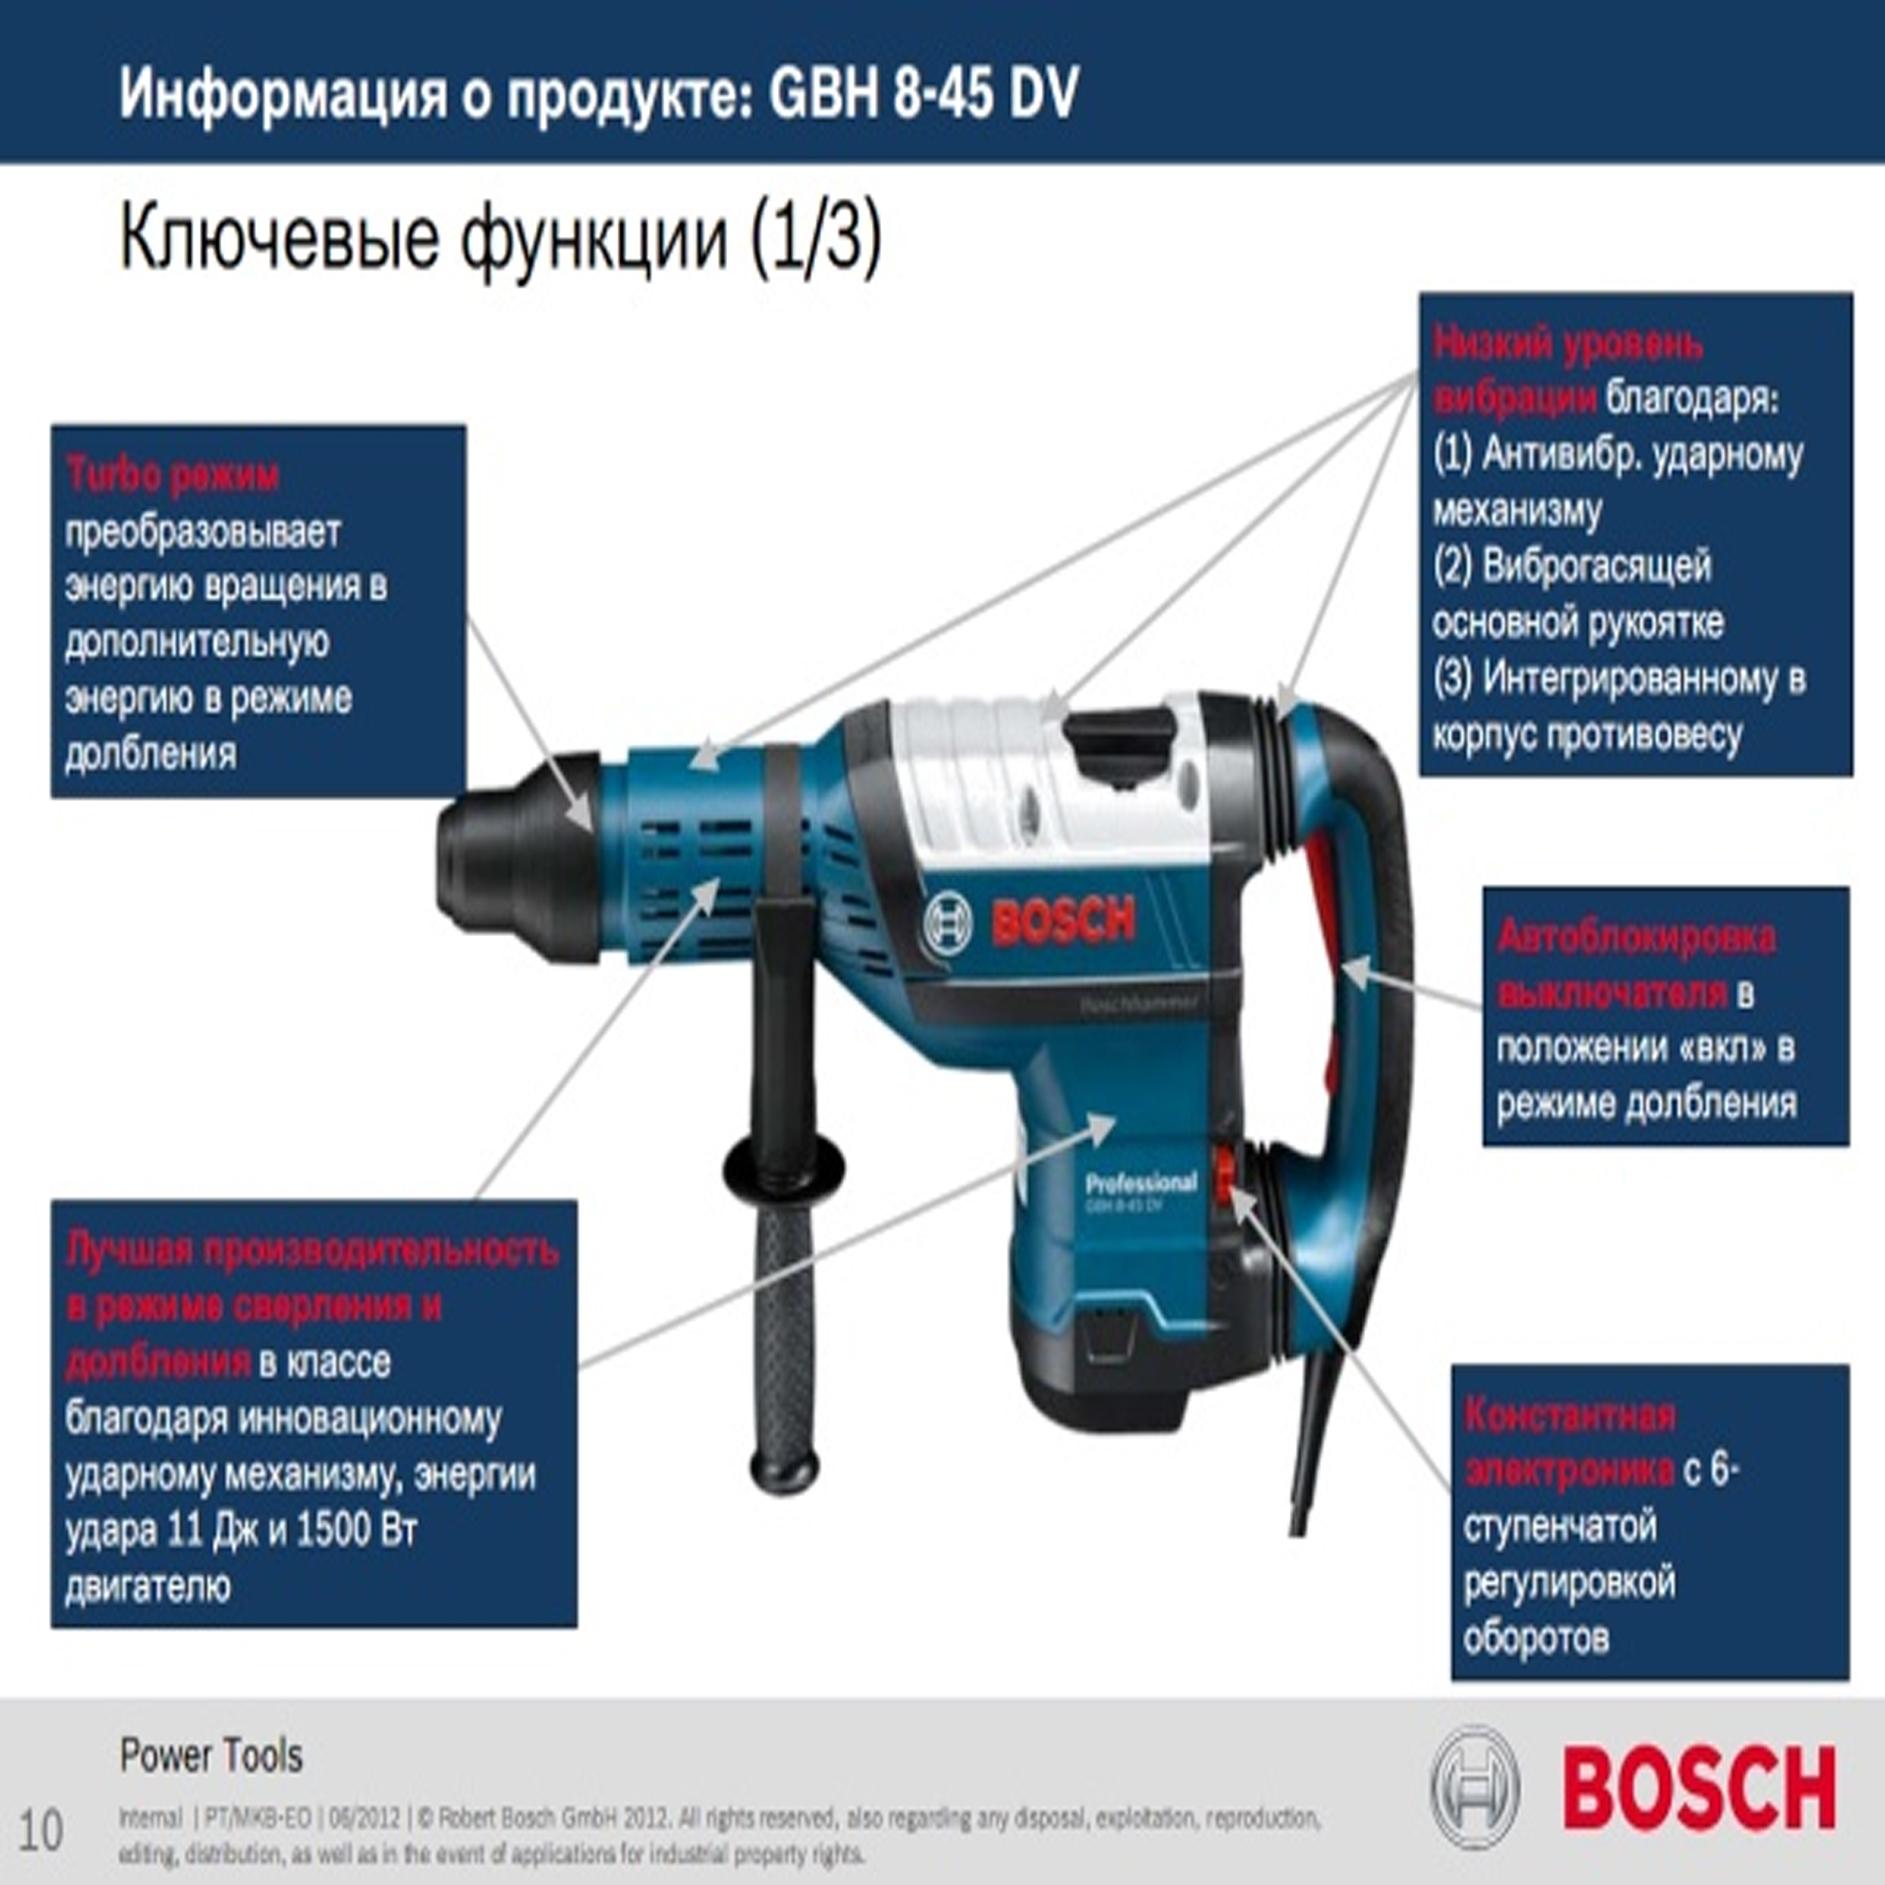 Harga Jual Bosch GBH 8-45 DV Mesin Bor Tembok Professional